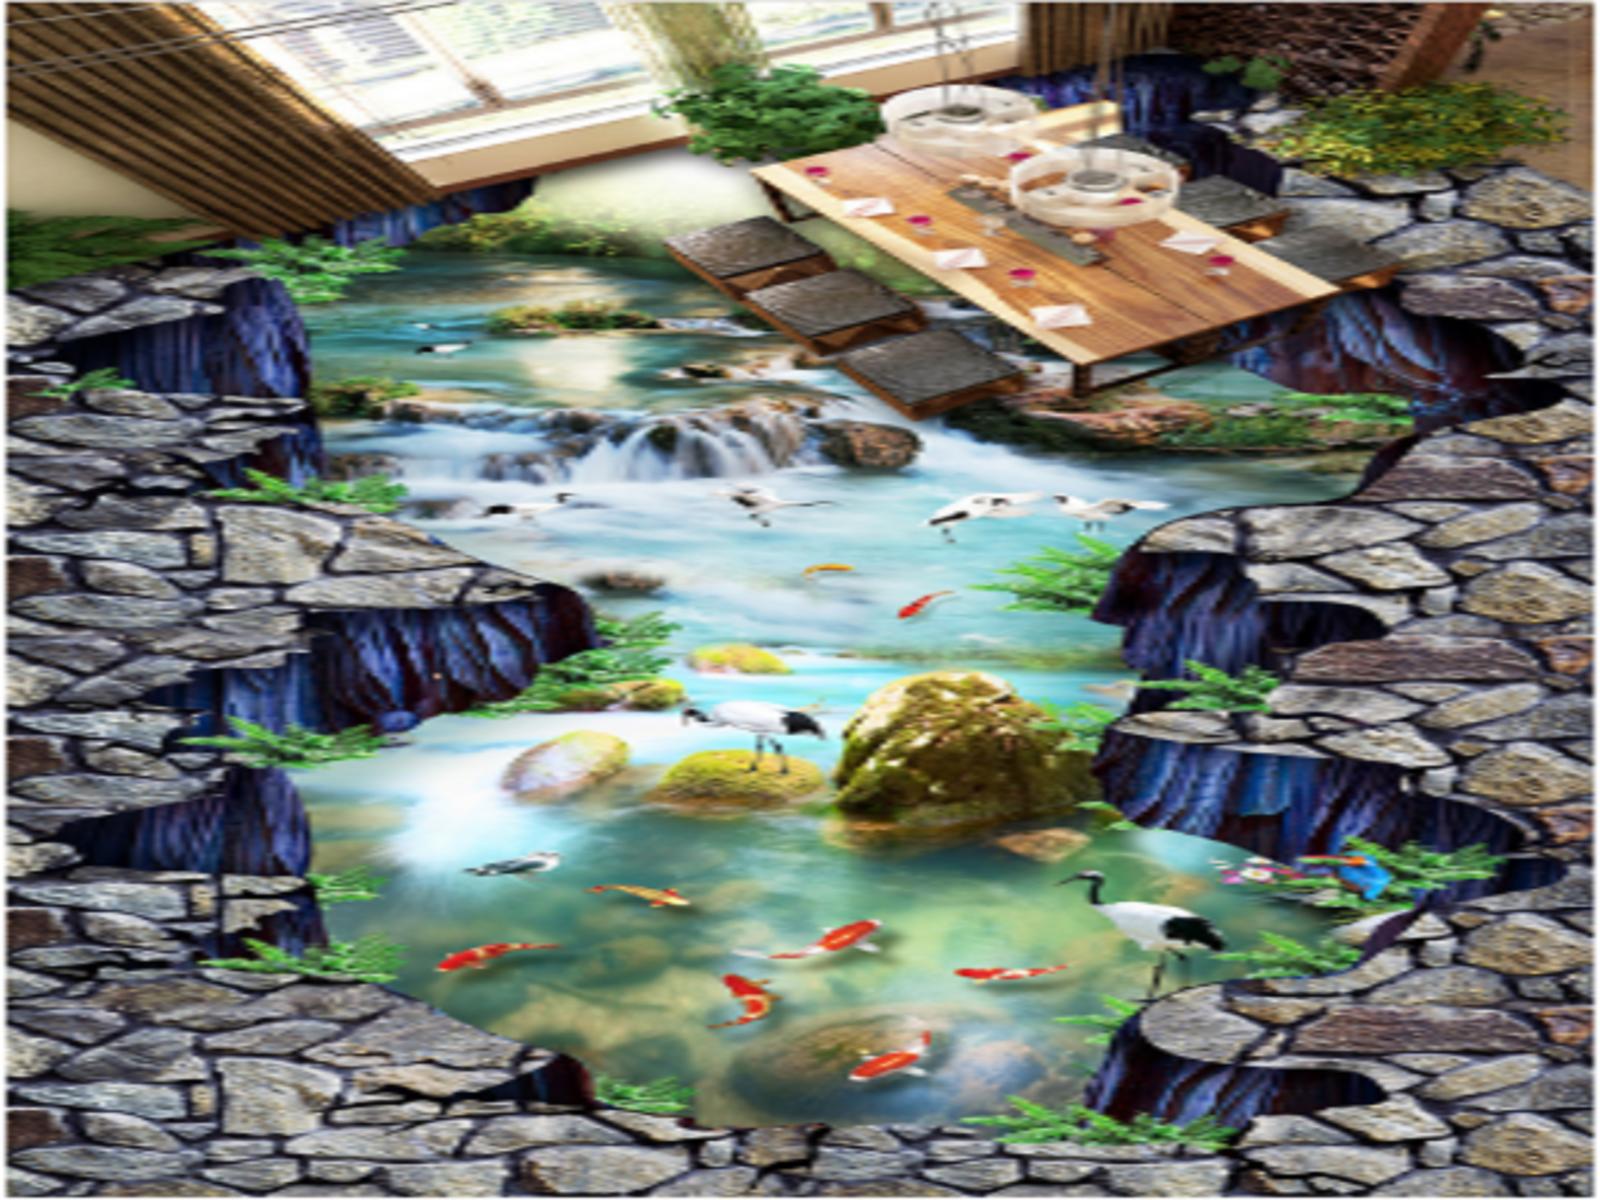 3D Weiß Crane Rock 5 Floor WallPaper Murals Wall Print 5D AJ WALLPAPER UK Lemon